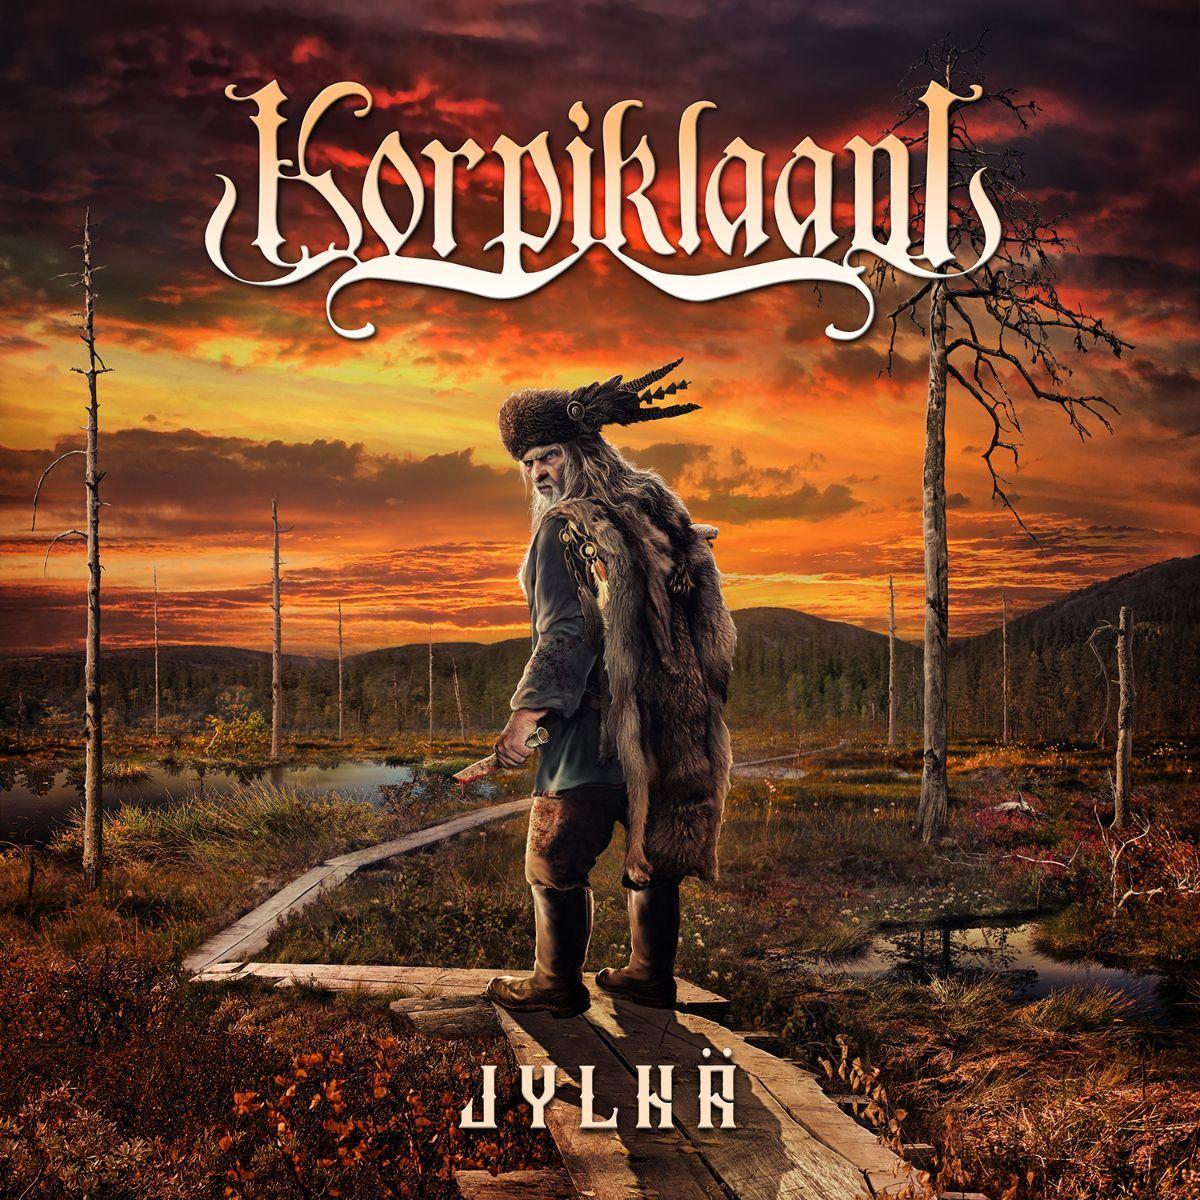 korpiklaani - jylha - album cover